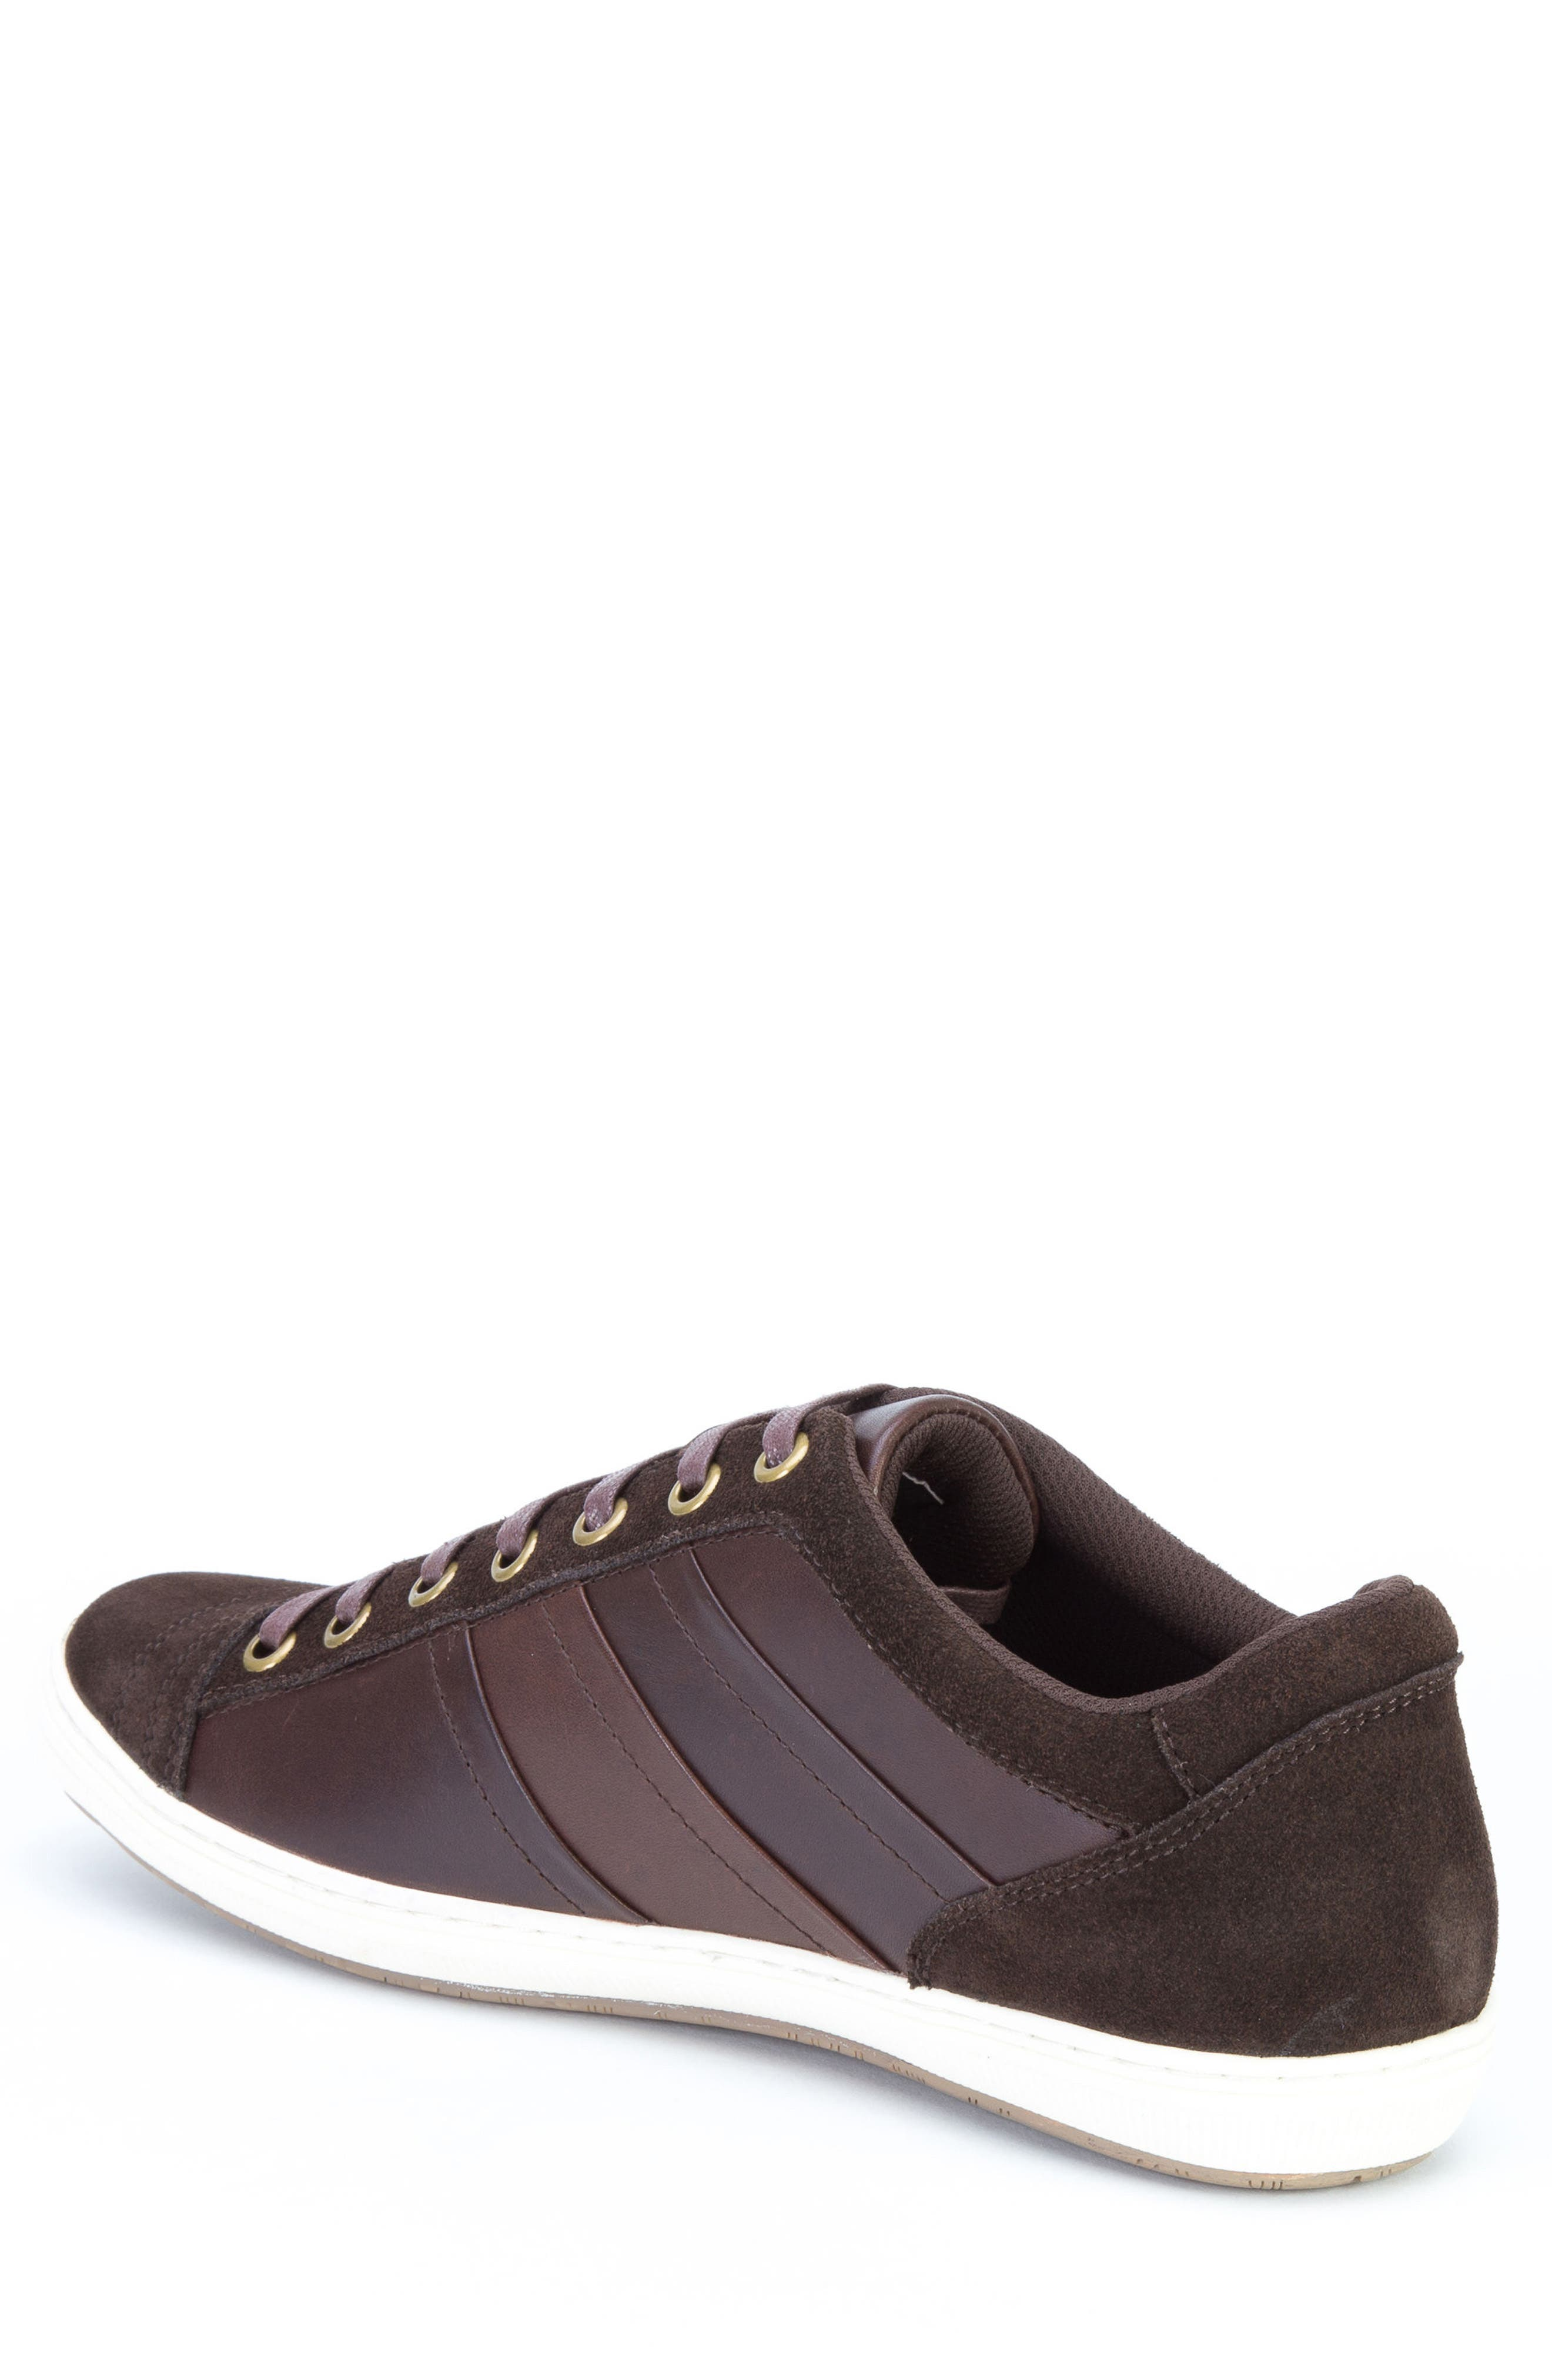 Alternate Image 2  - Zanzara Jive Sneaker (Men)